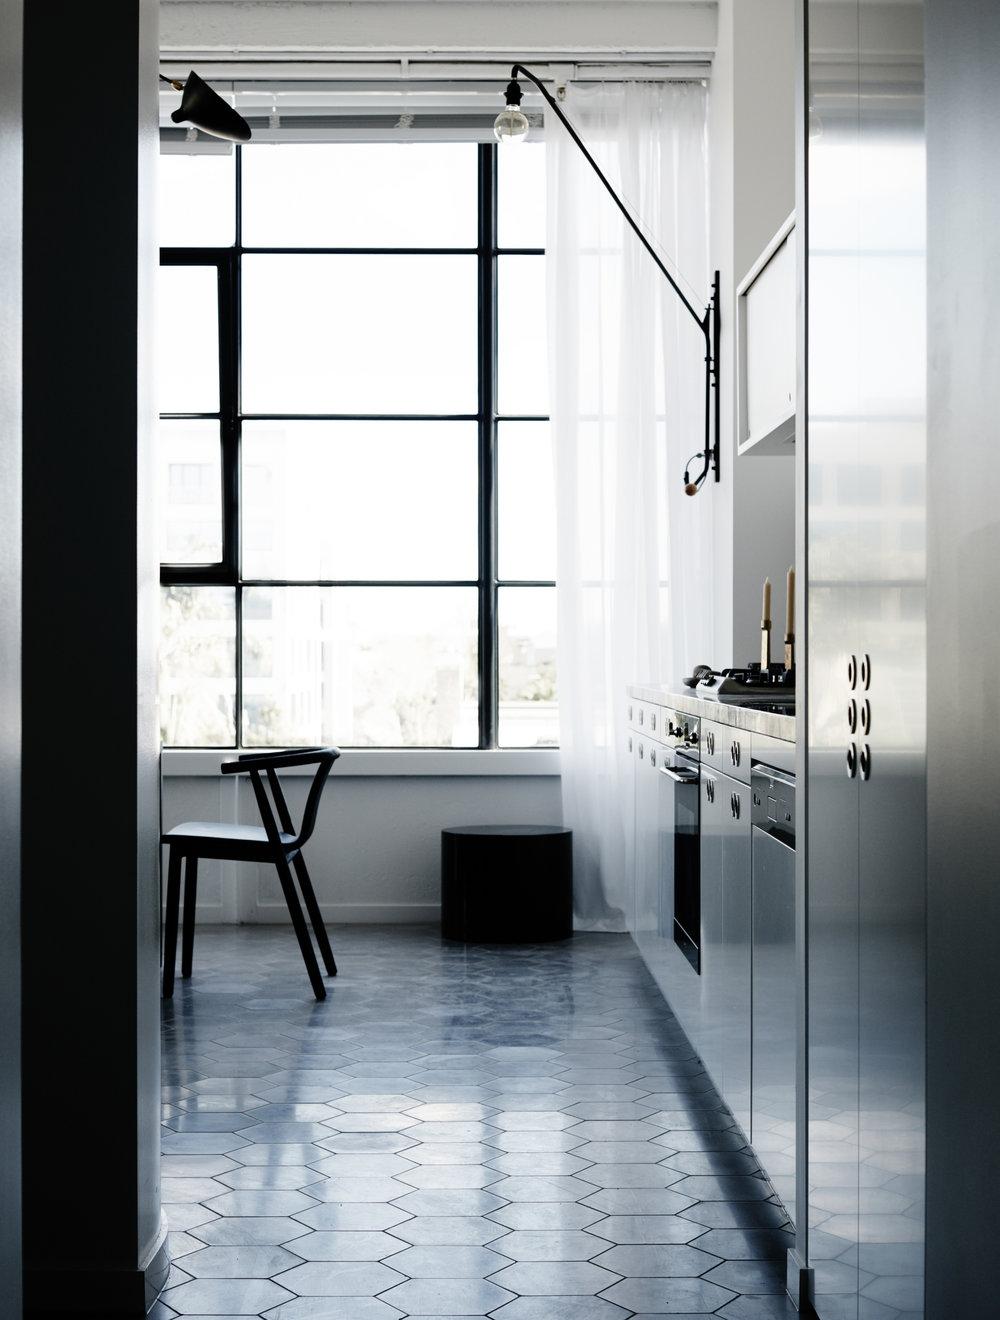 Infinite Design Studio_Cleveland & Co Residence_Photography Credit Prue Ruscoe_02.jpg